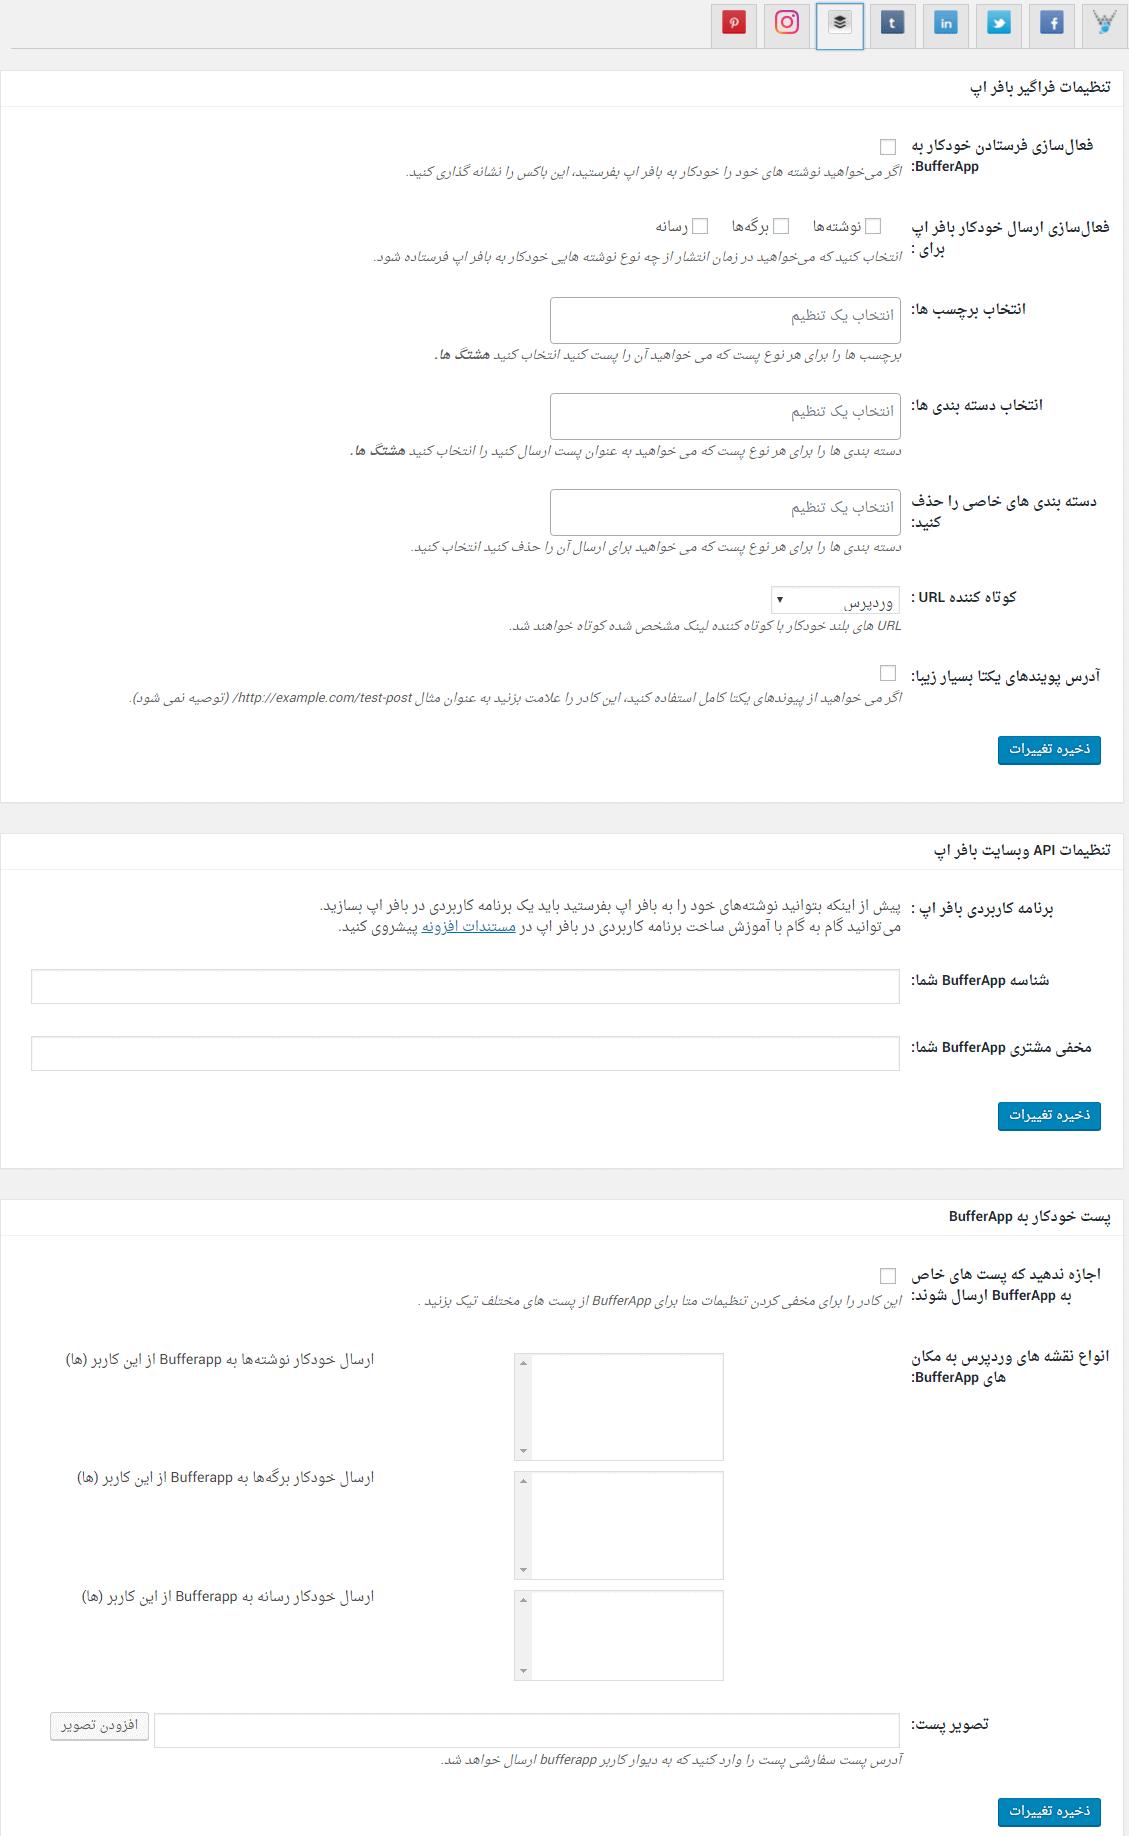 تنظیمات ارسال به BufferApp